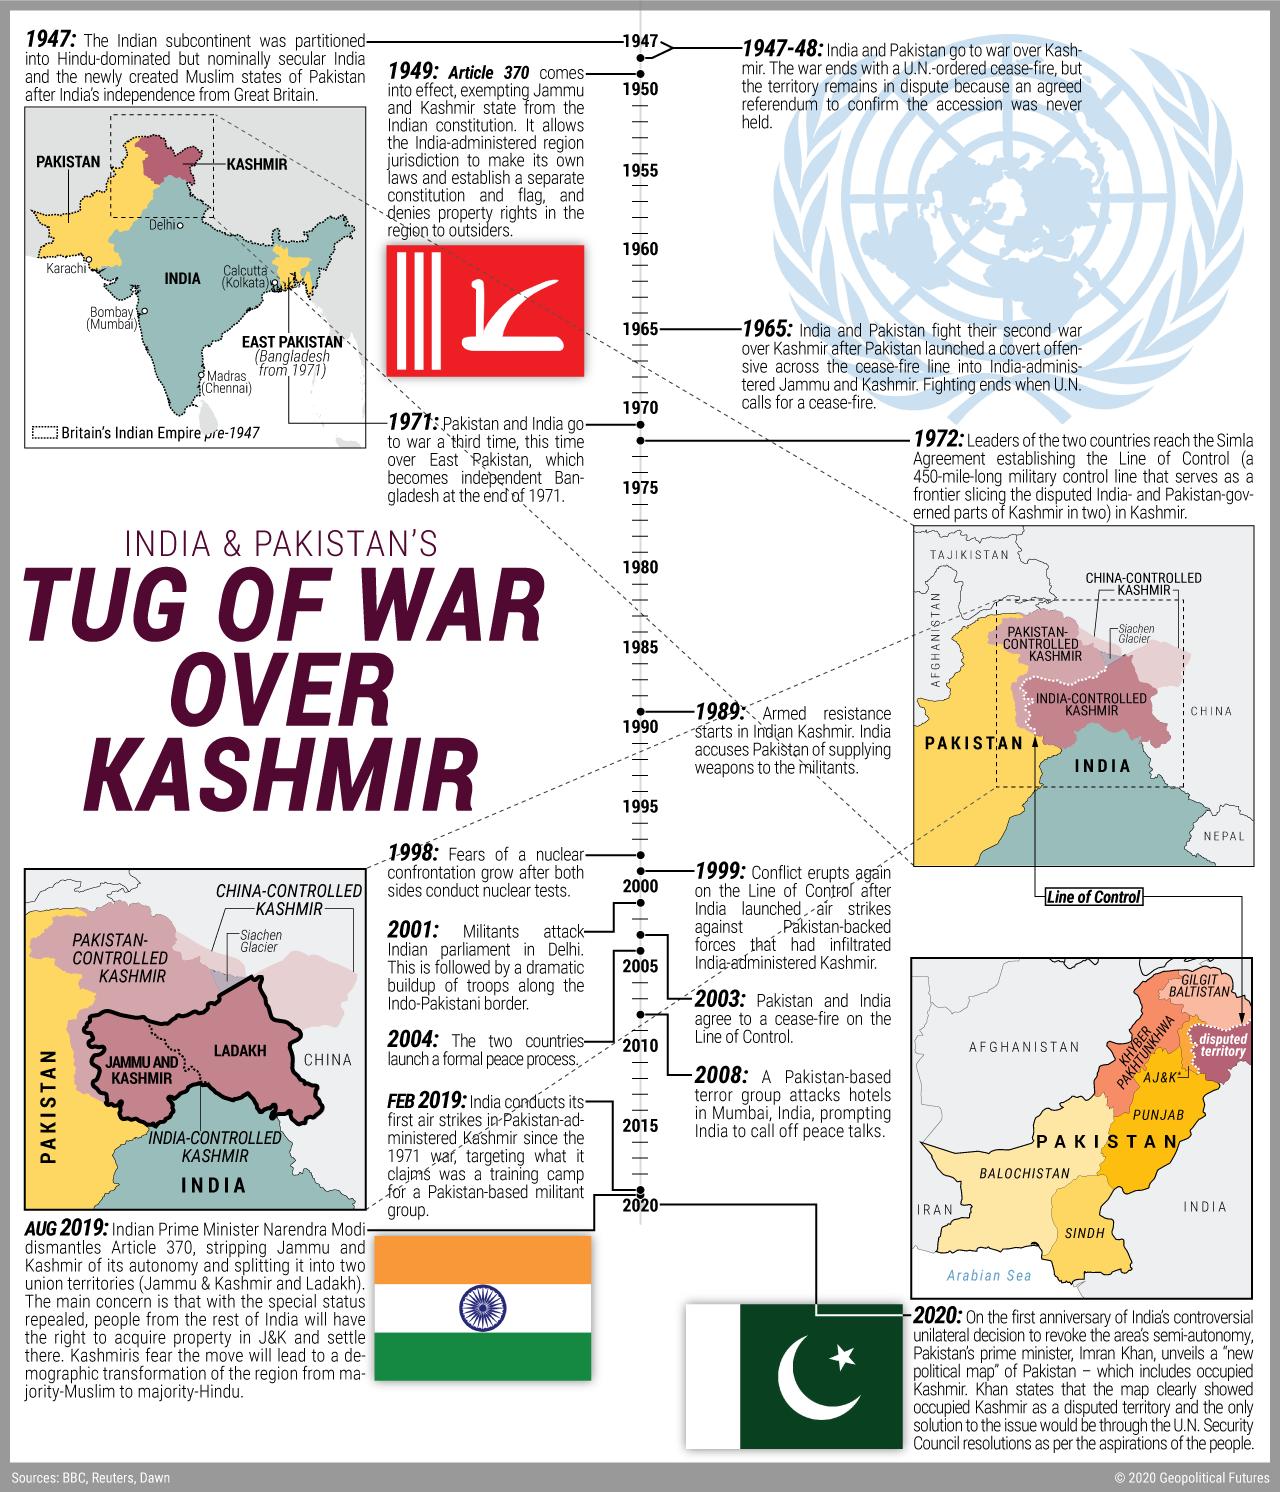 Tug of War Over Kashmir